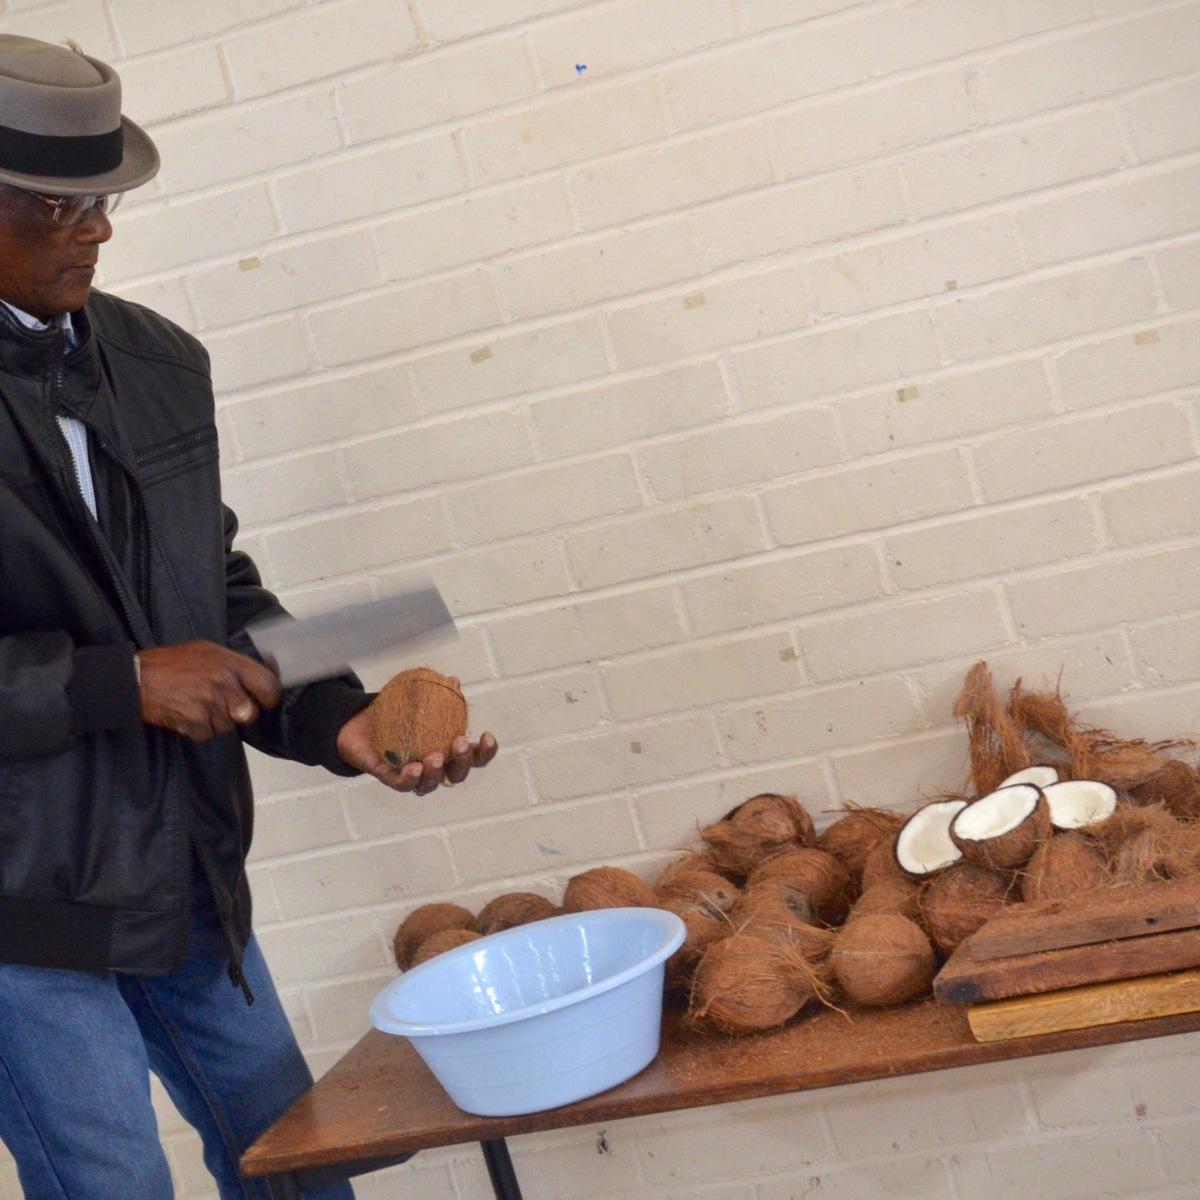 Coconut cracking lesson 1